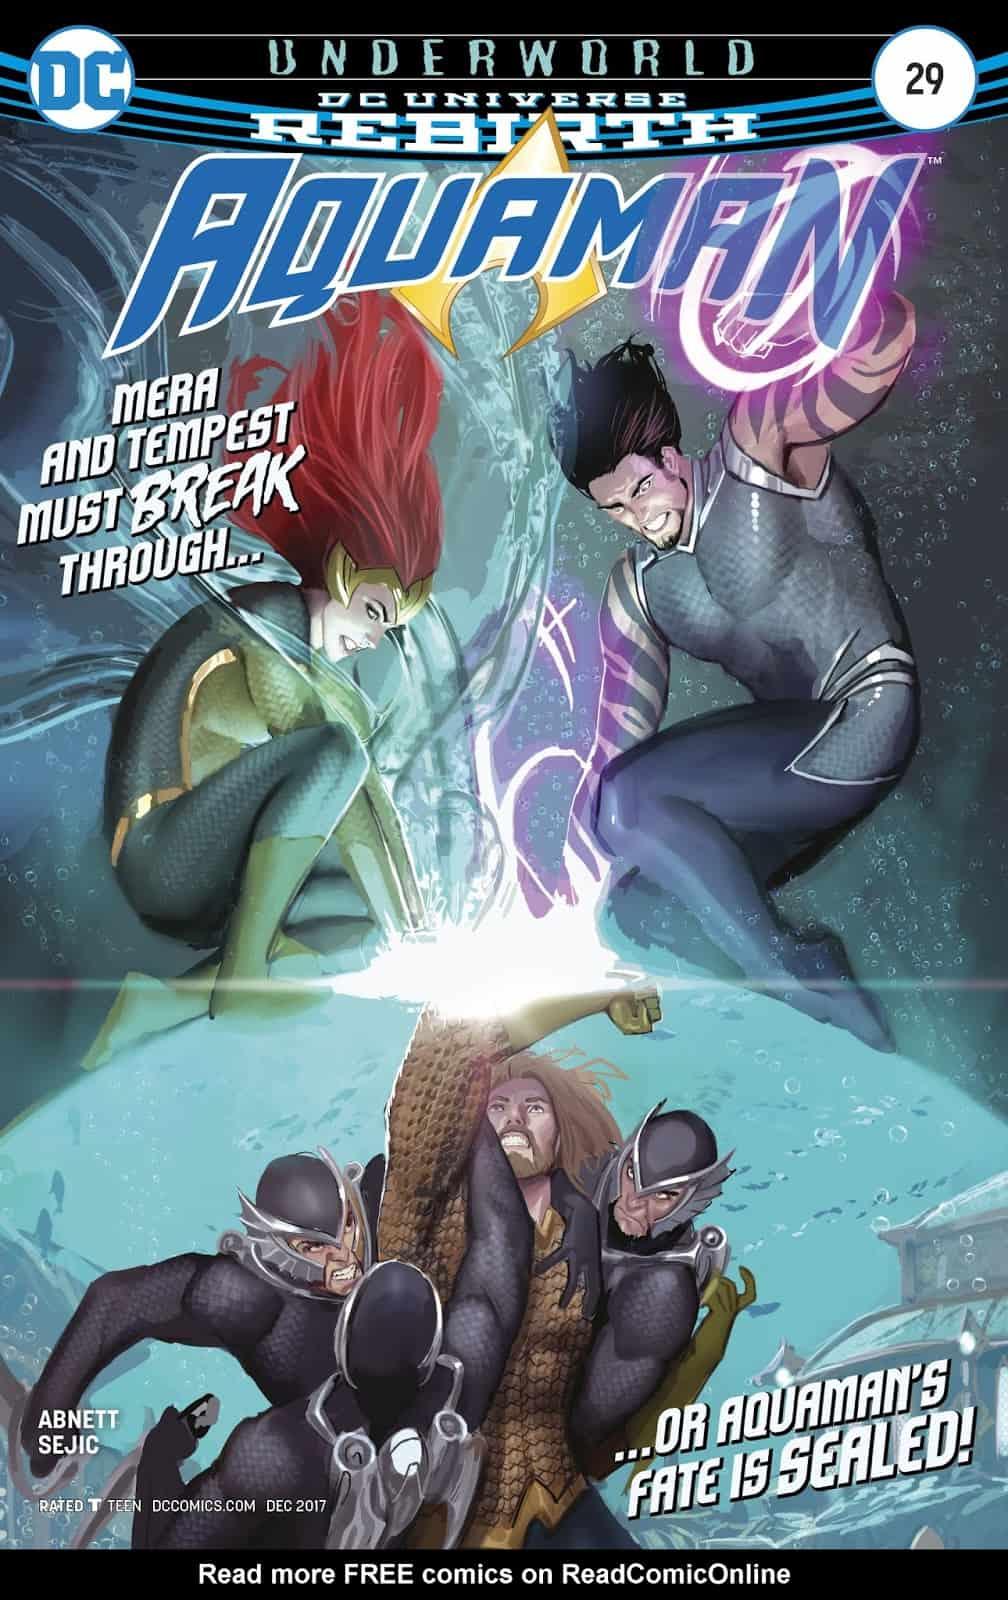 Underworld-Part 5- Speak Truth to Power  (Aquaman #29 Comic Review